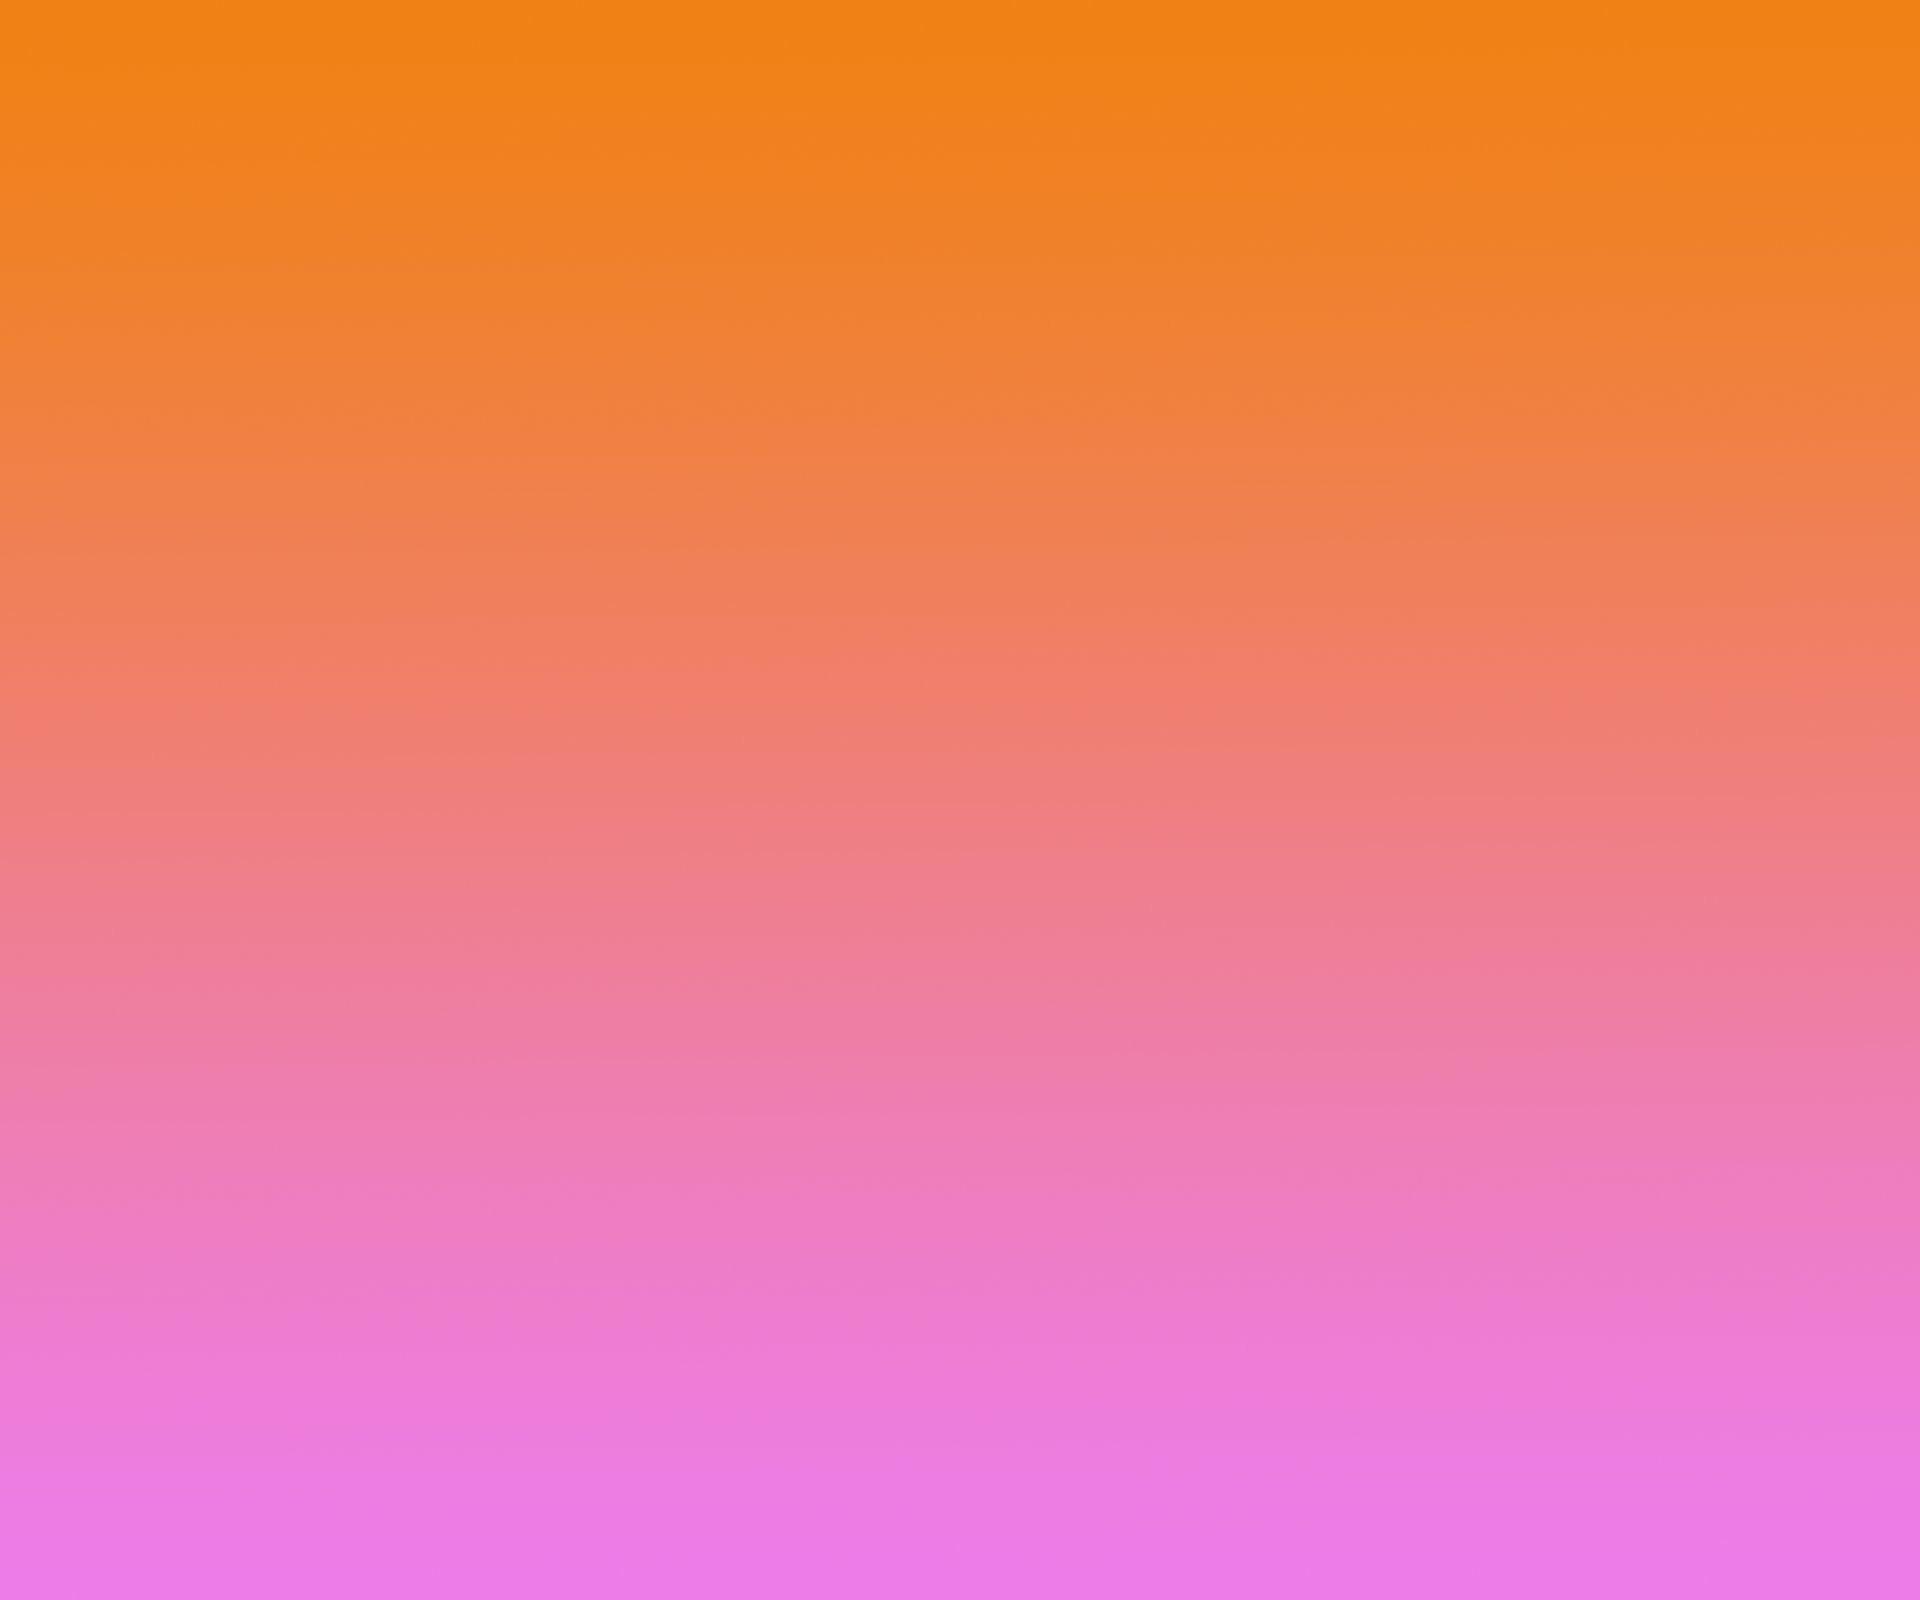 Orange Ombre Background Ombre backgrou…